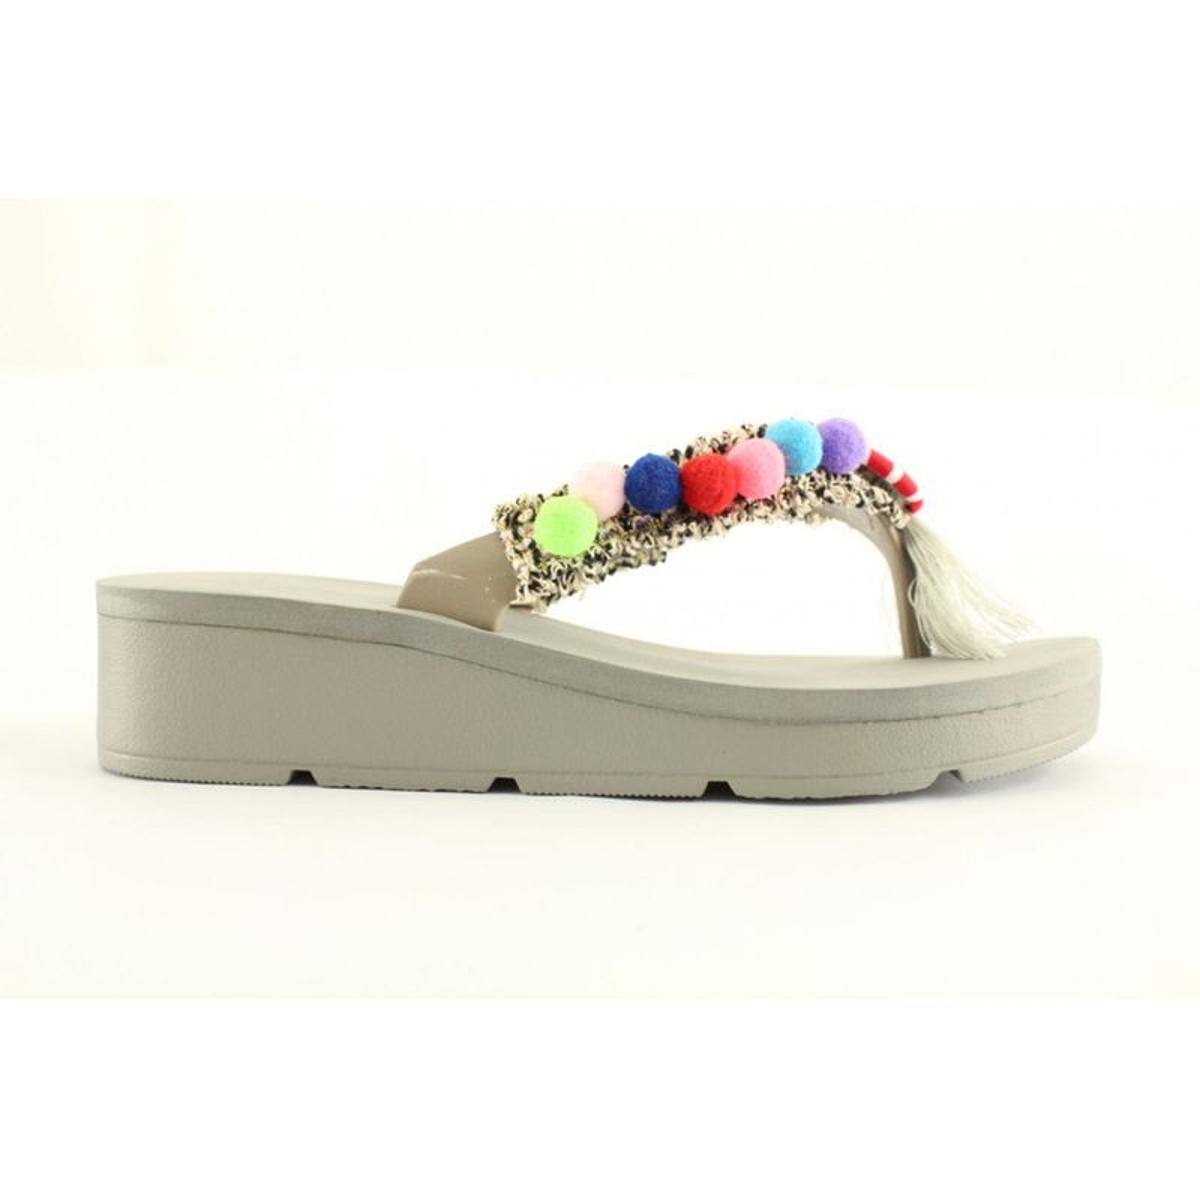 Sandales nu-pieds Kamoa